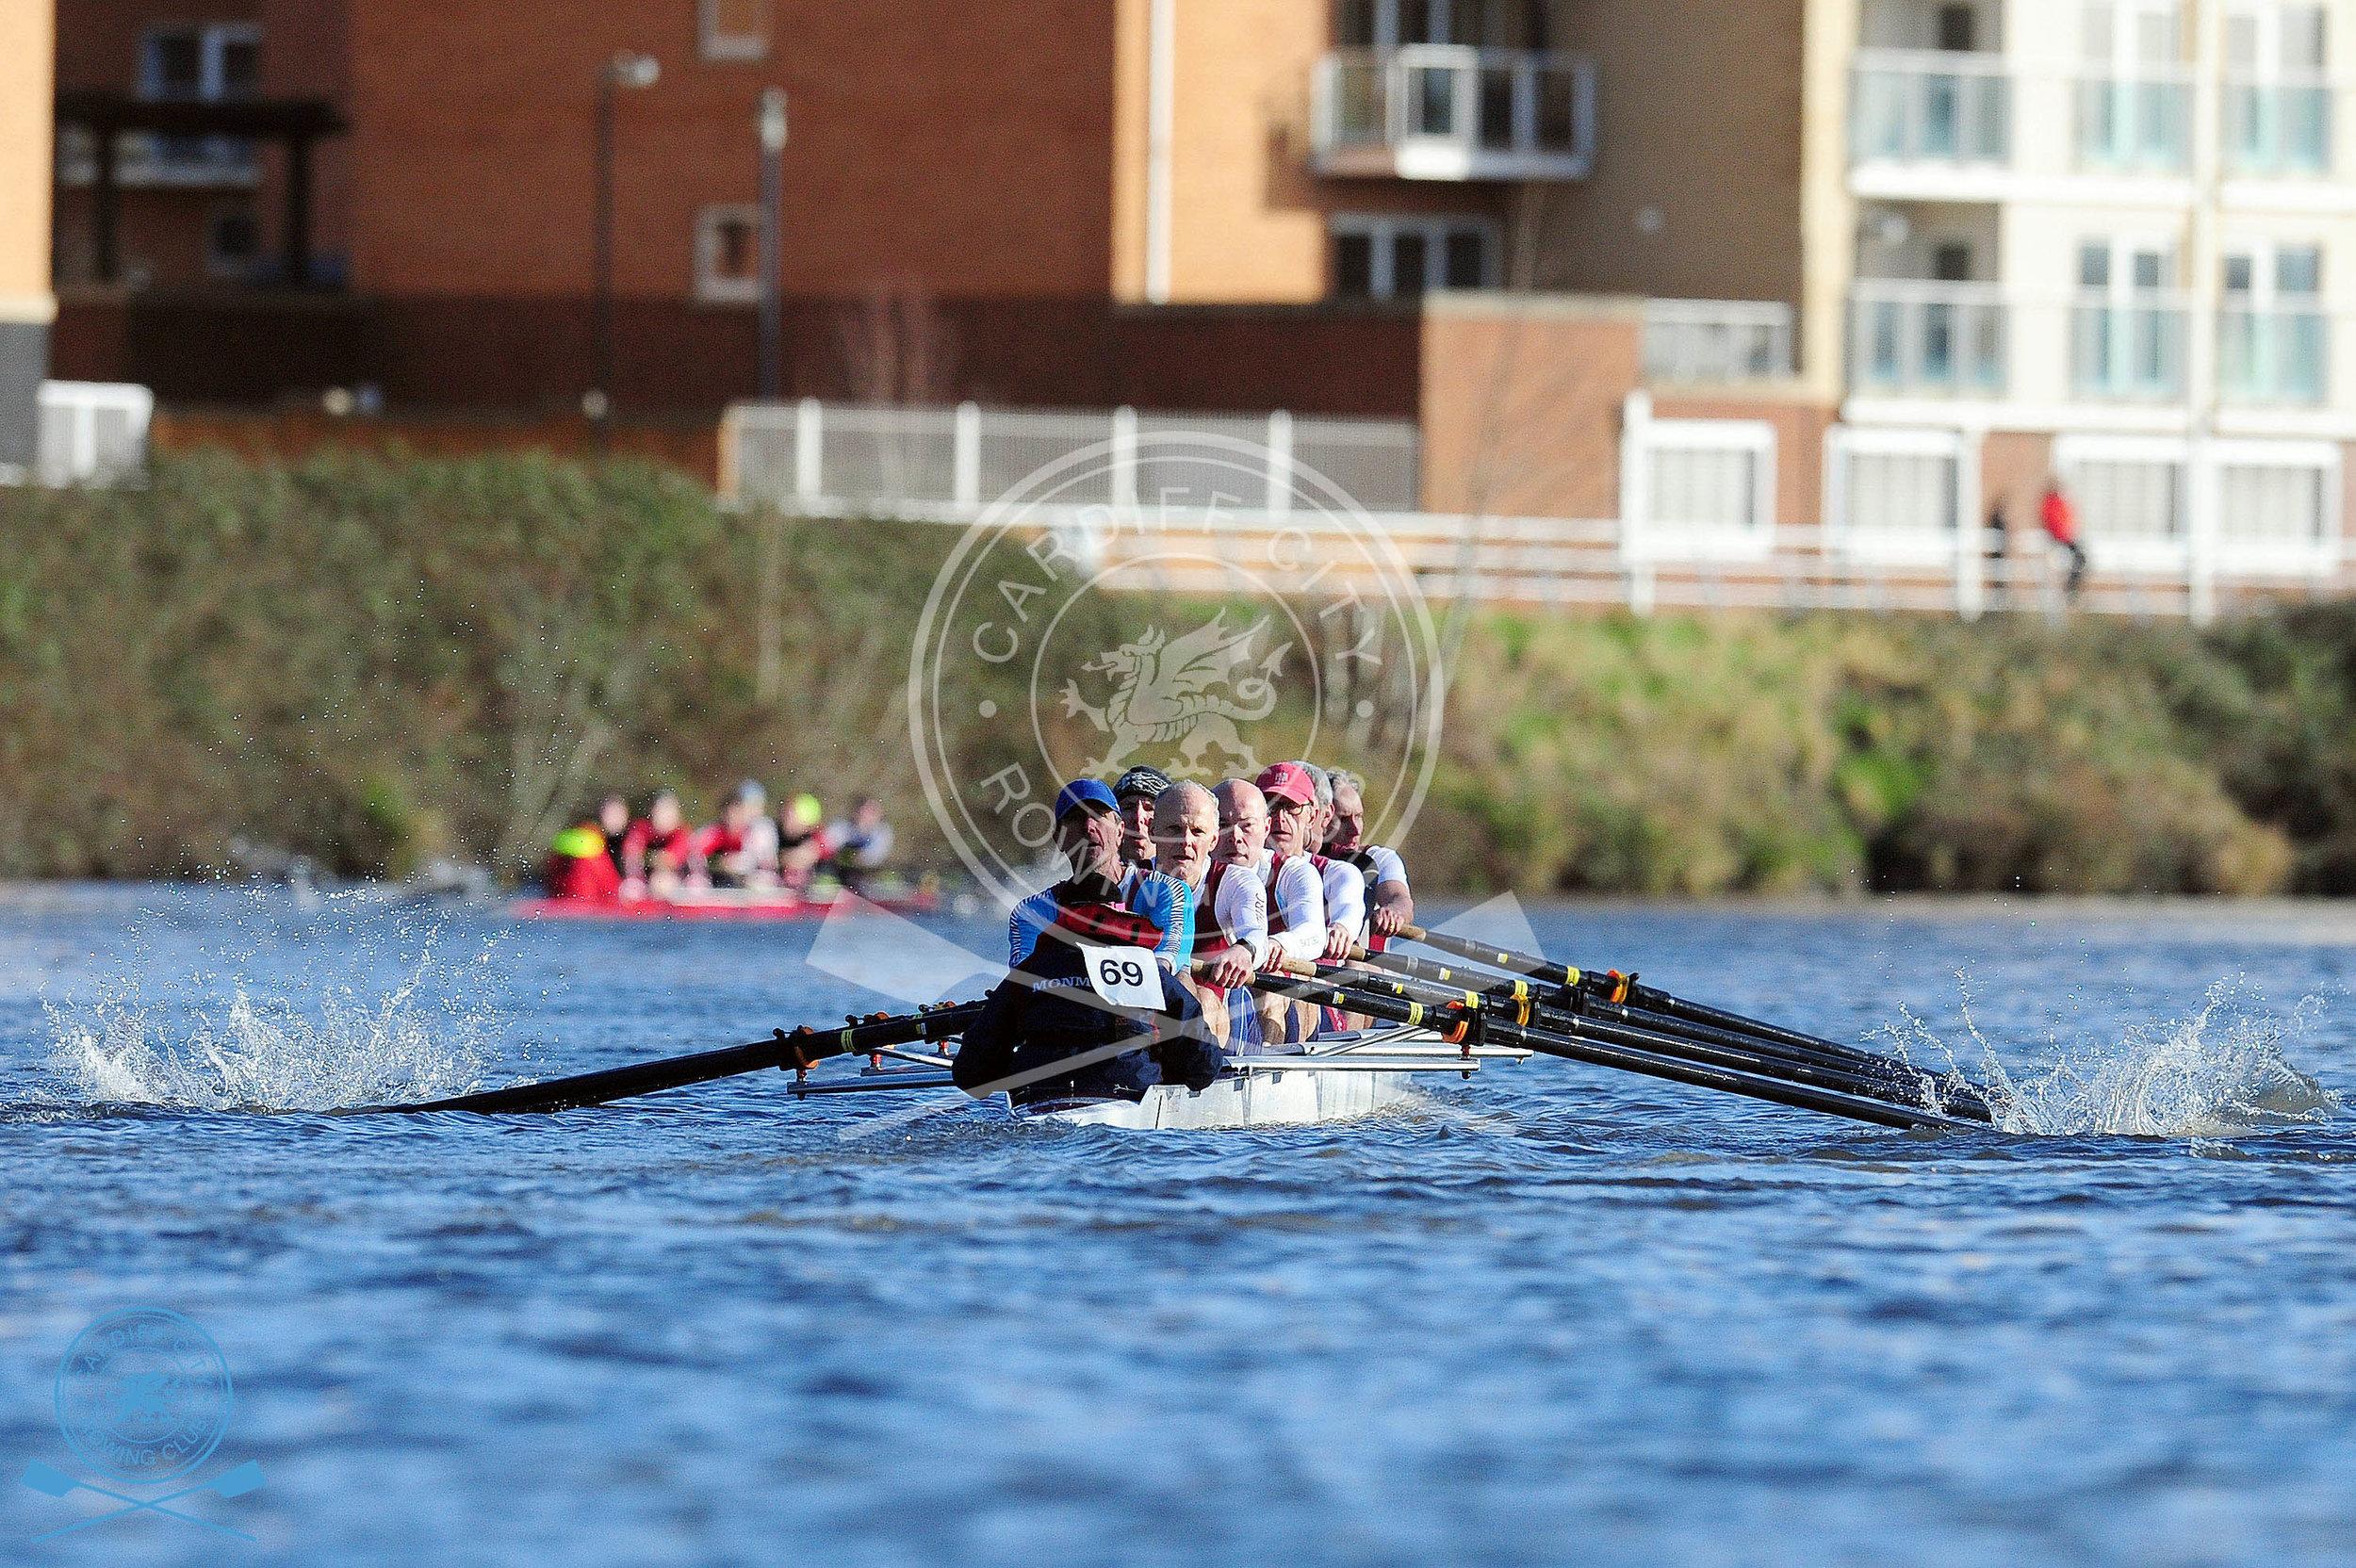 DW_280119_Cardiff_City_Rowing_238.jpg